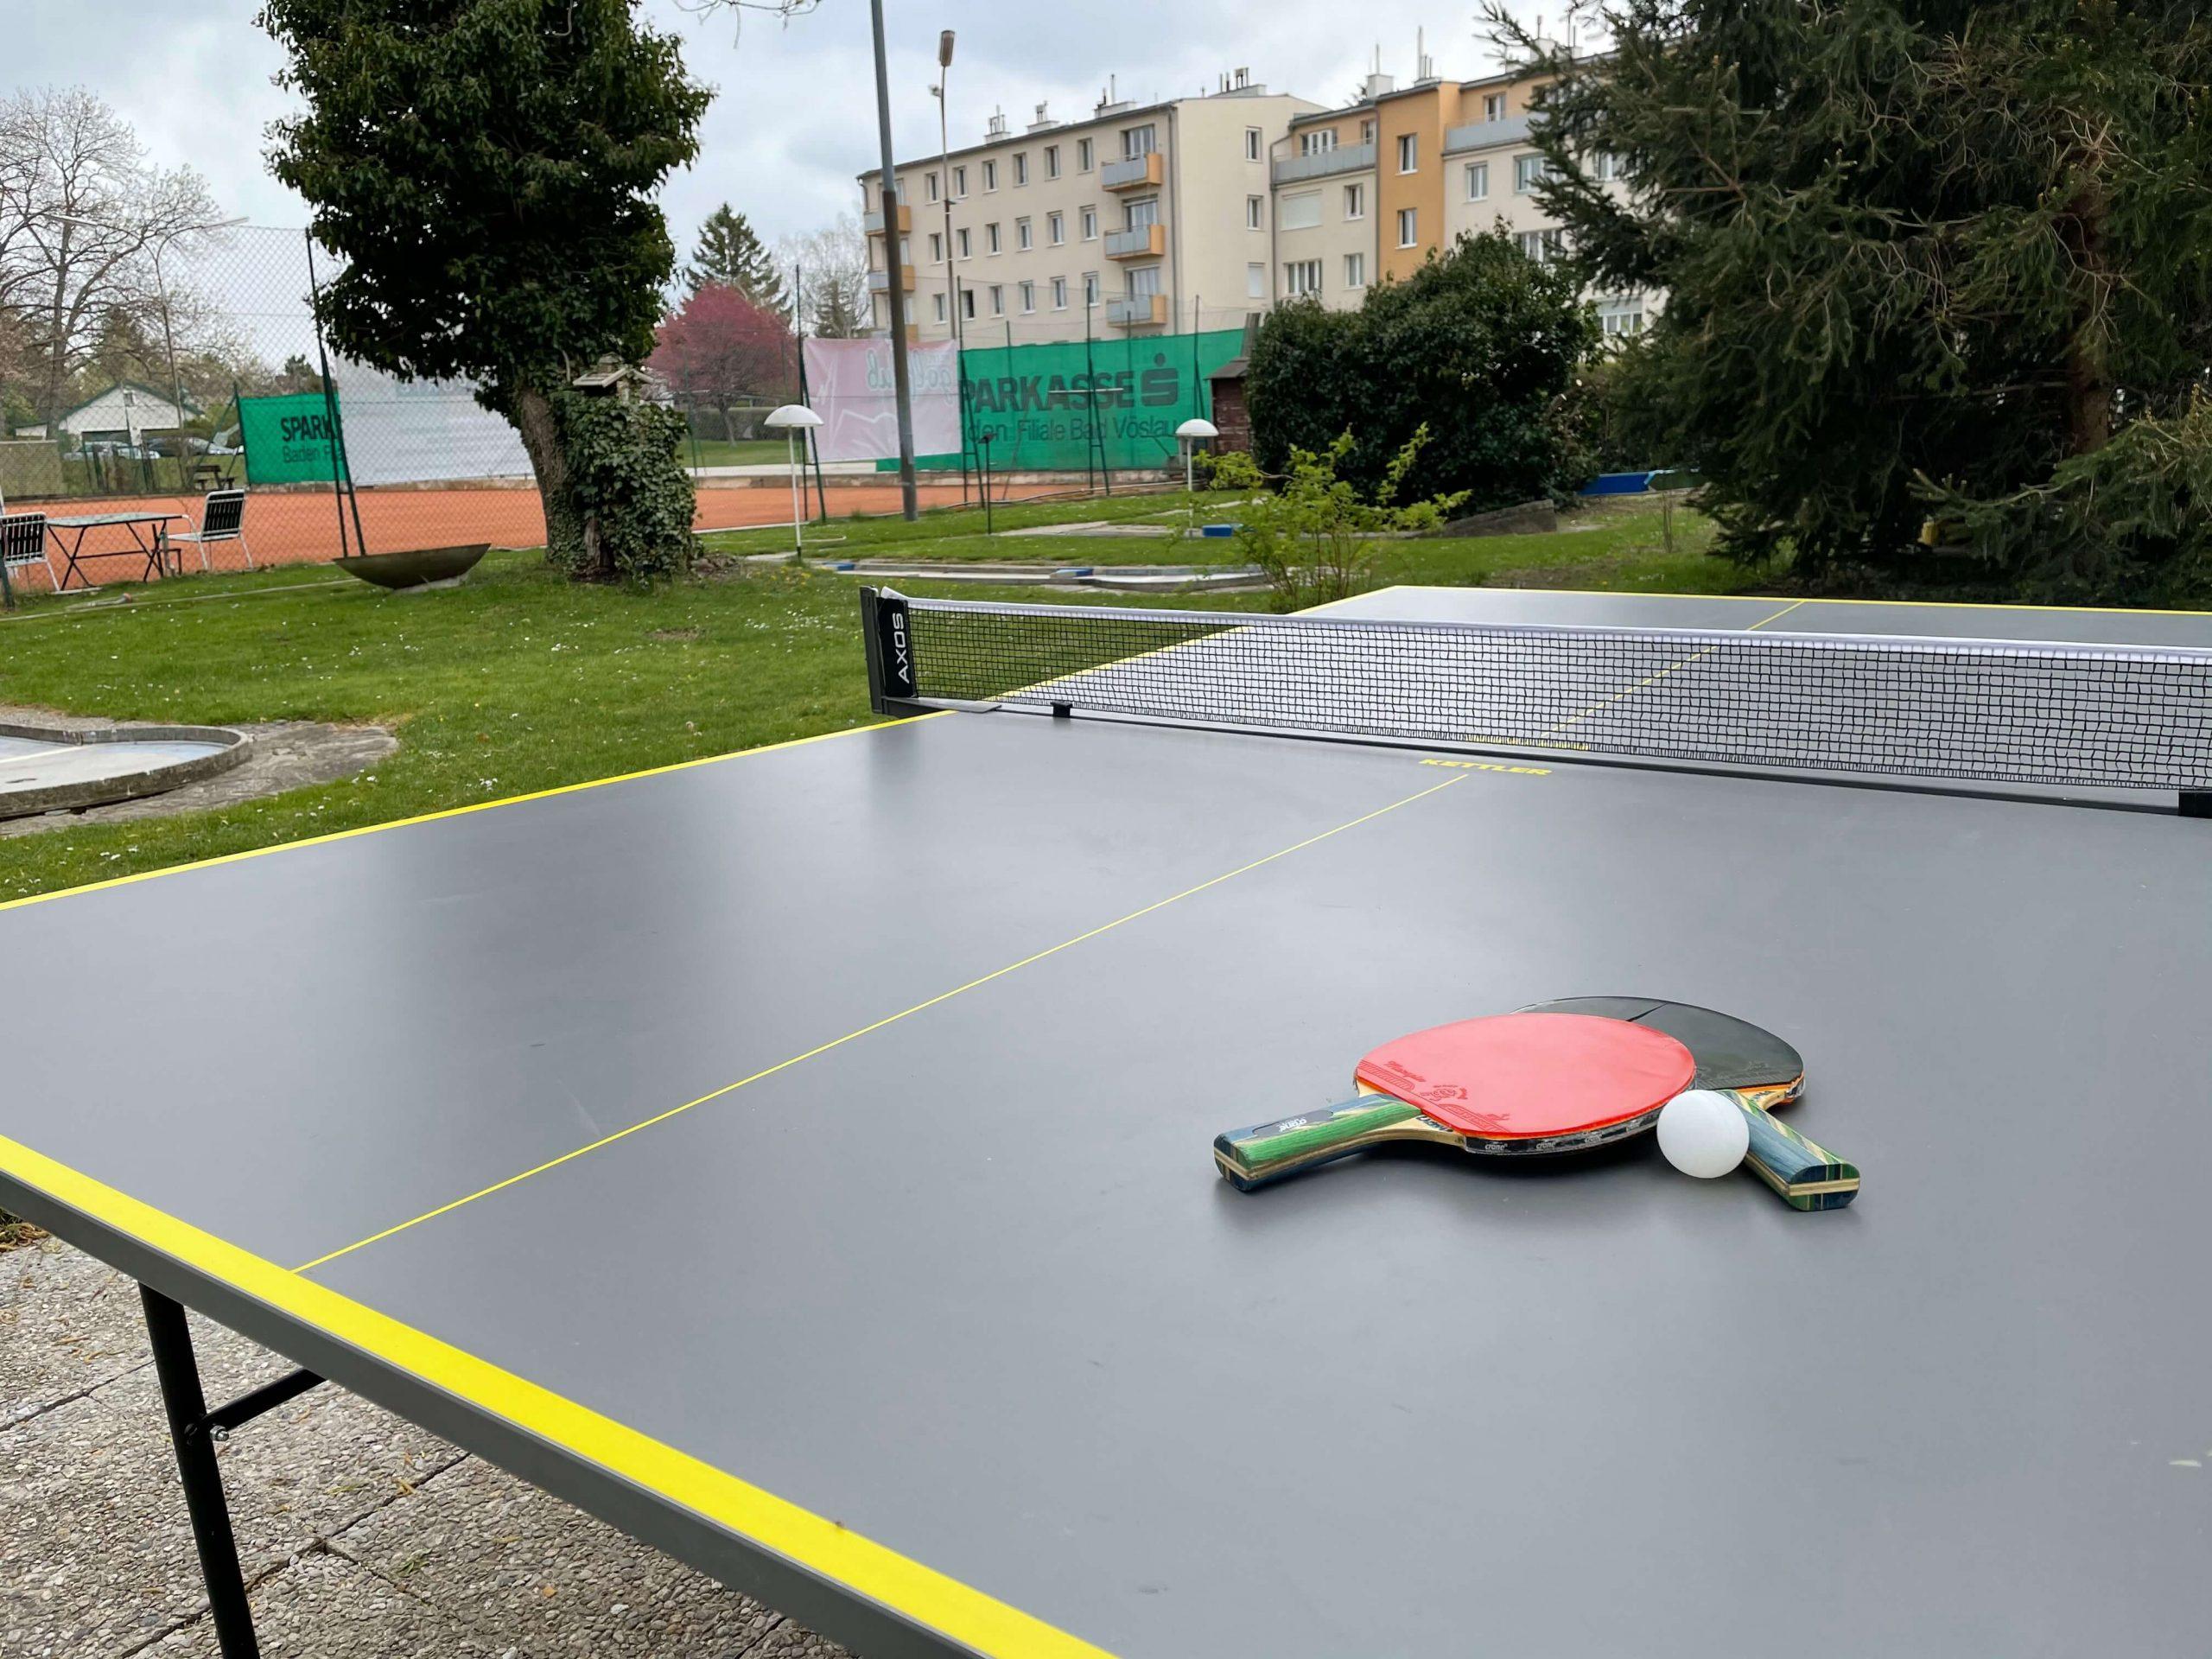 Chris-Corner-Tischtennis